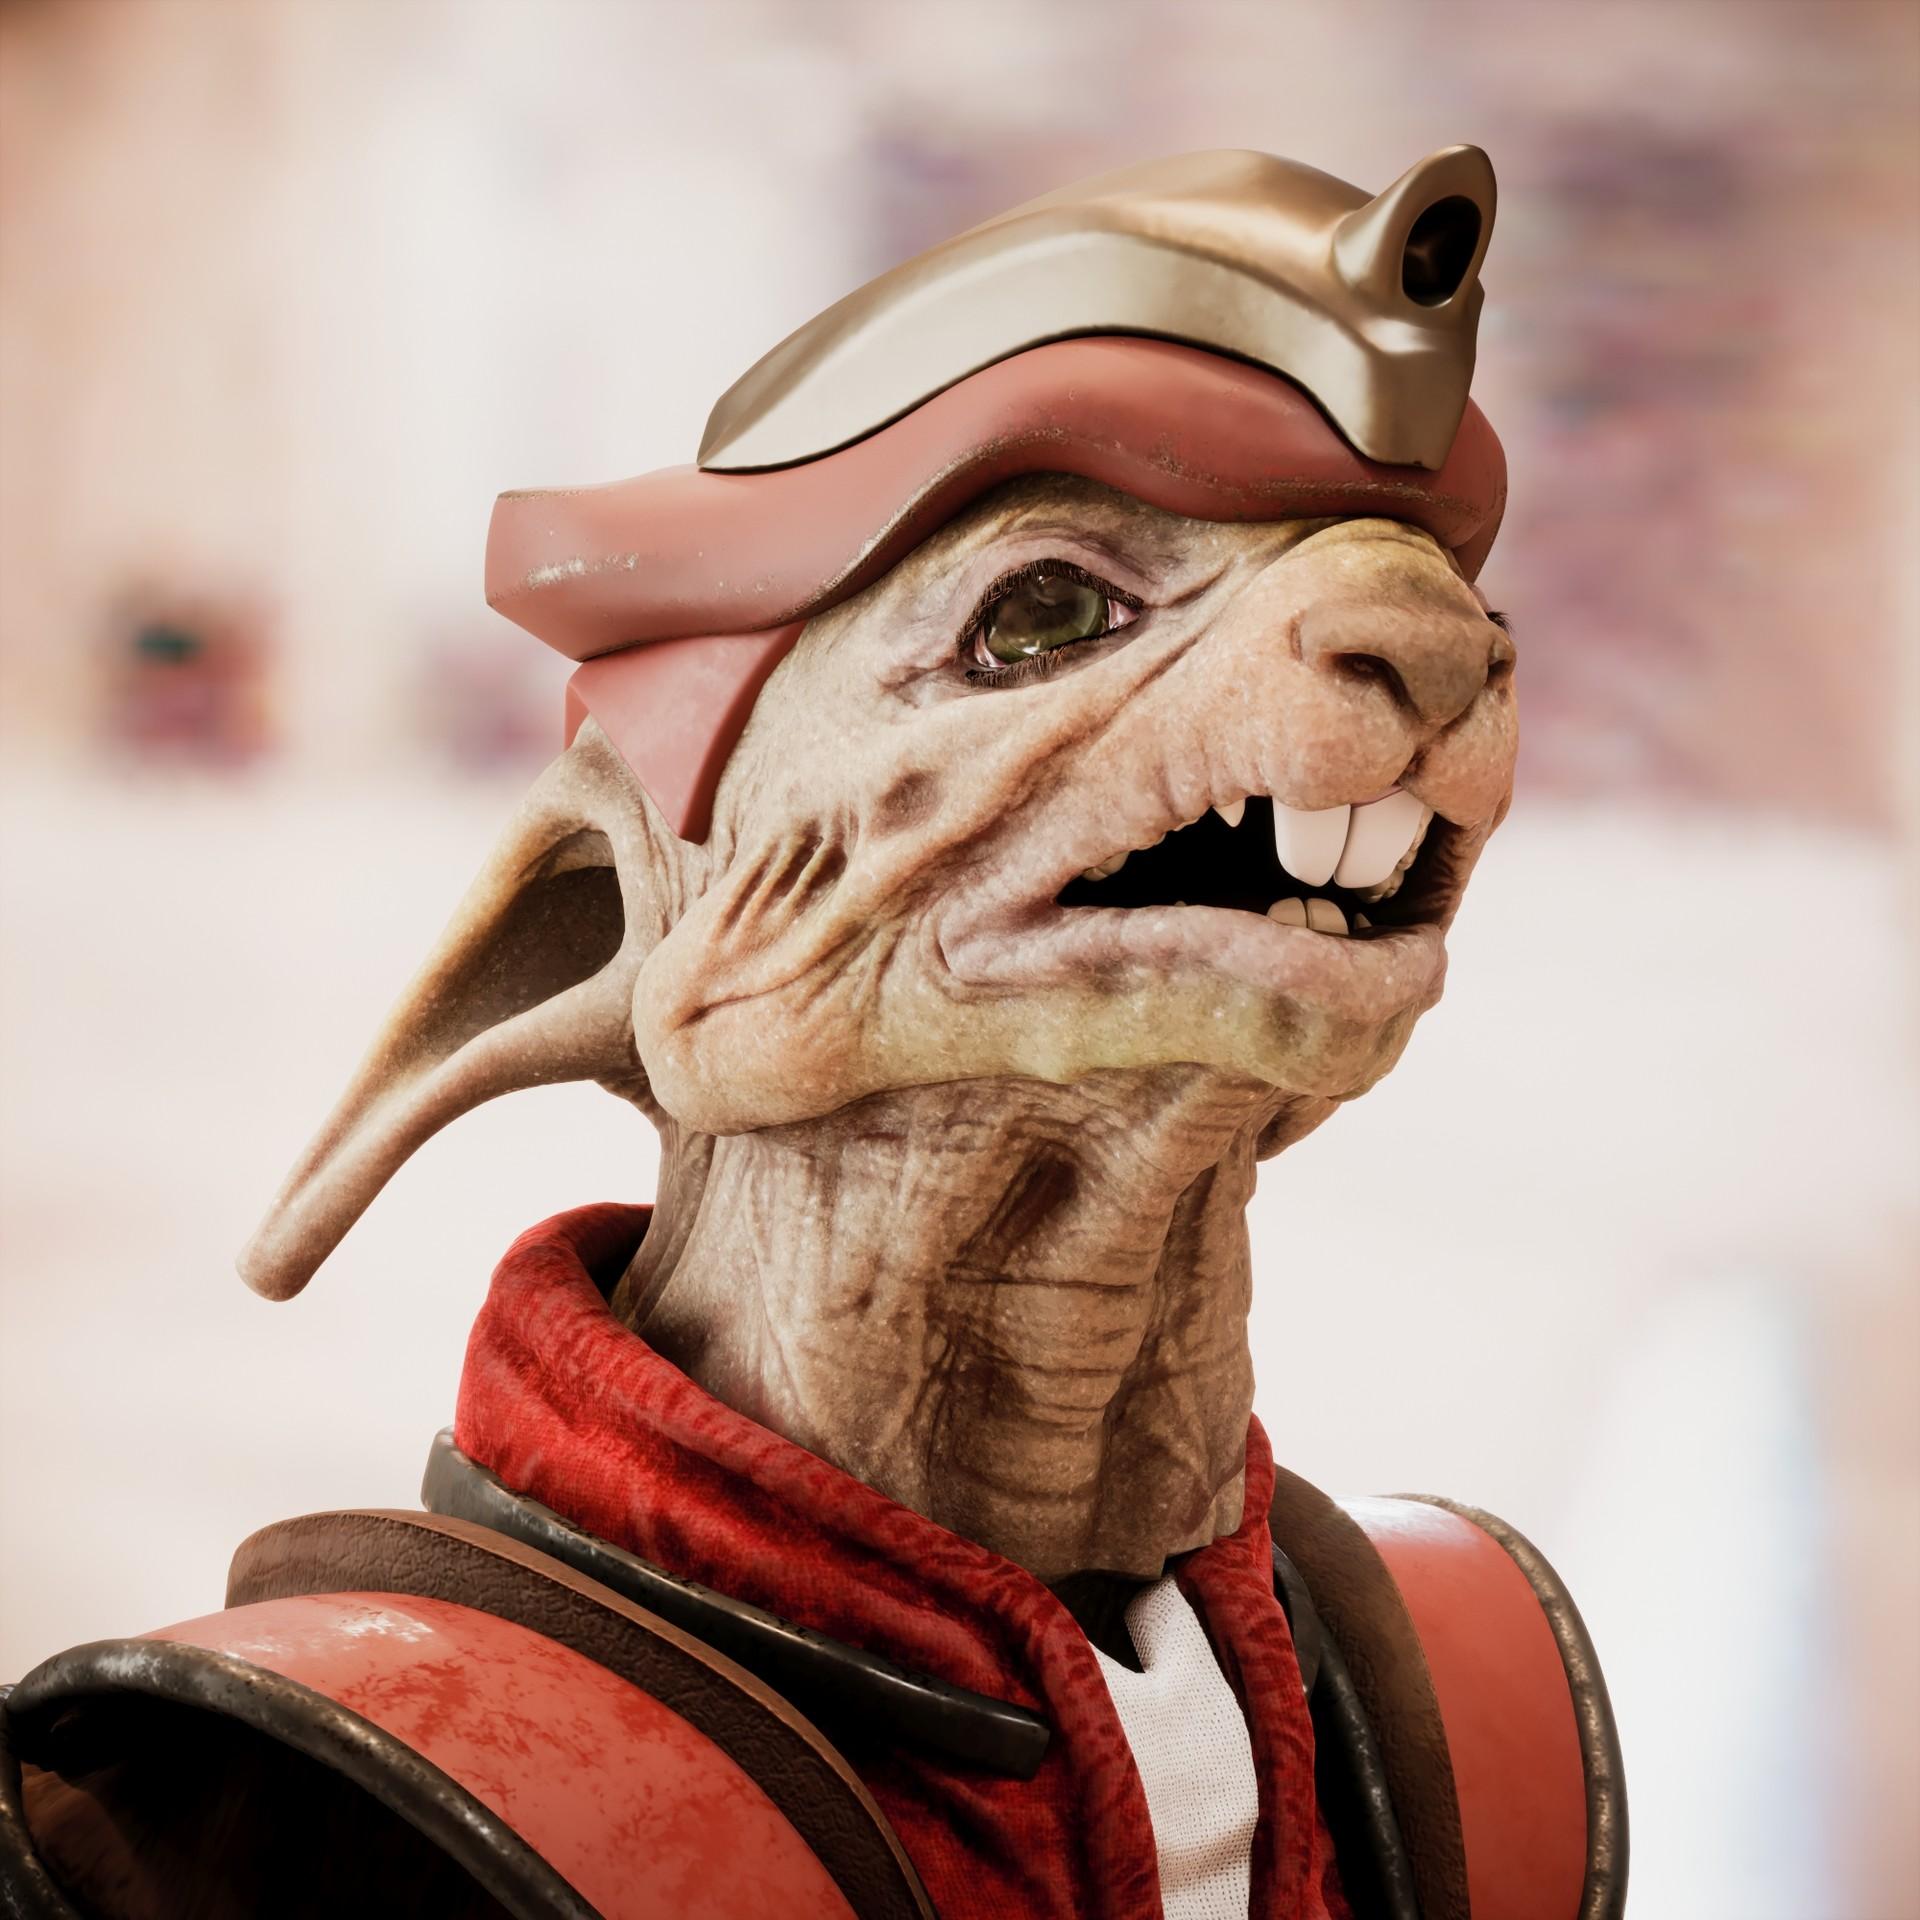 Luis santander alien 02